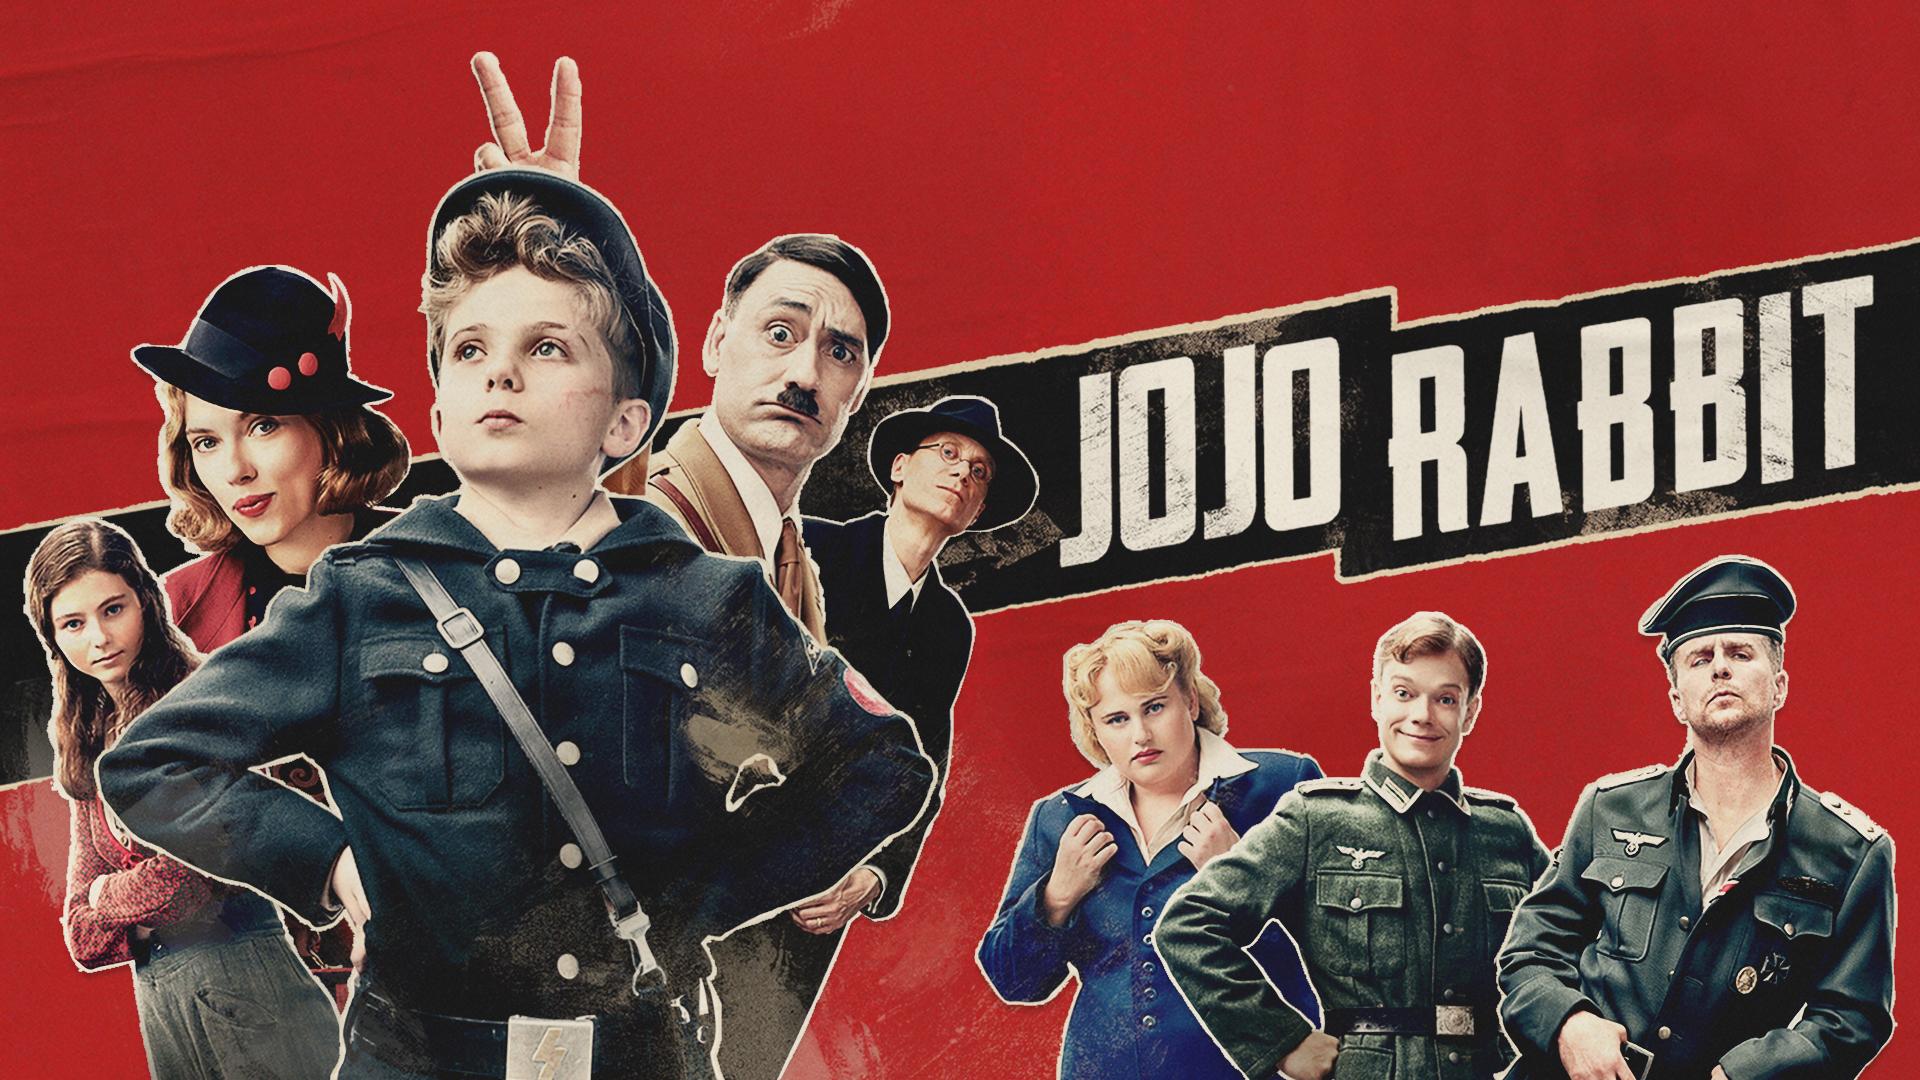 Image result for jojo rabbit movie poster landscape